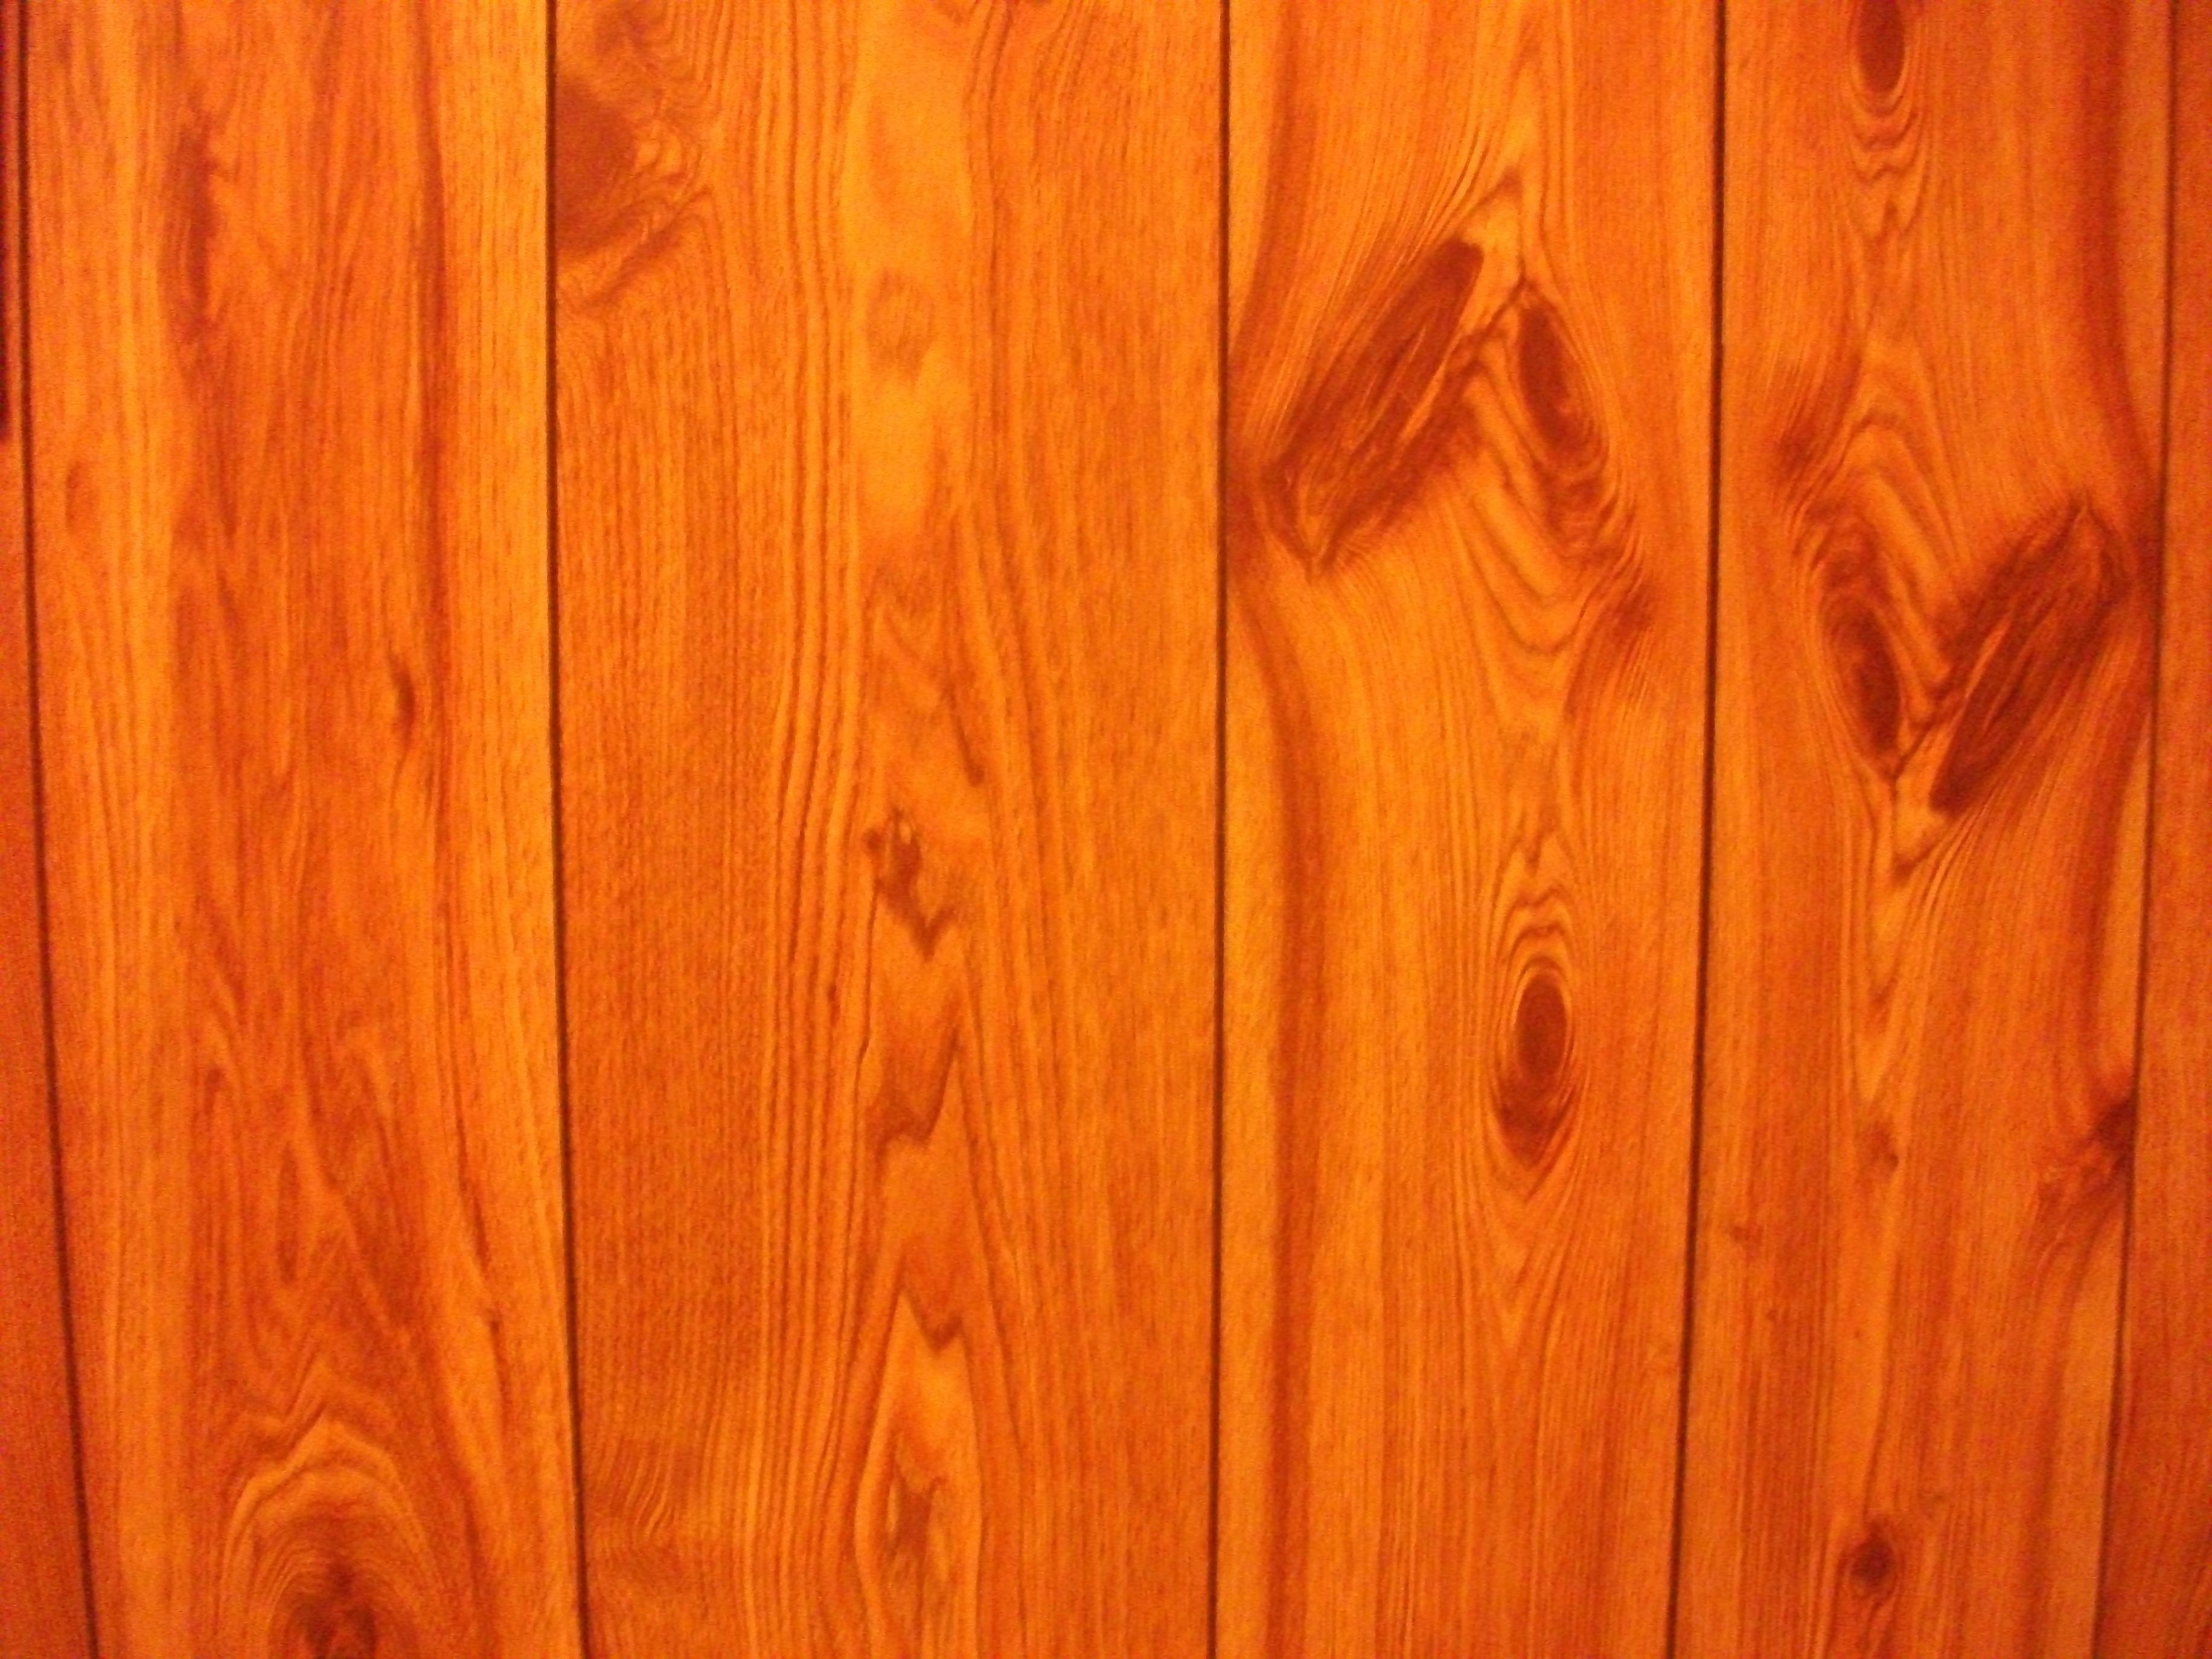 Artificial Wood Grain Texture